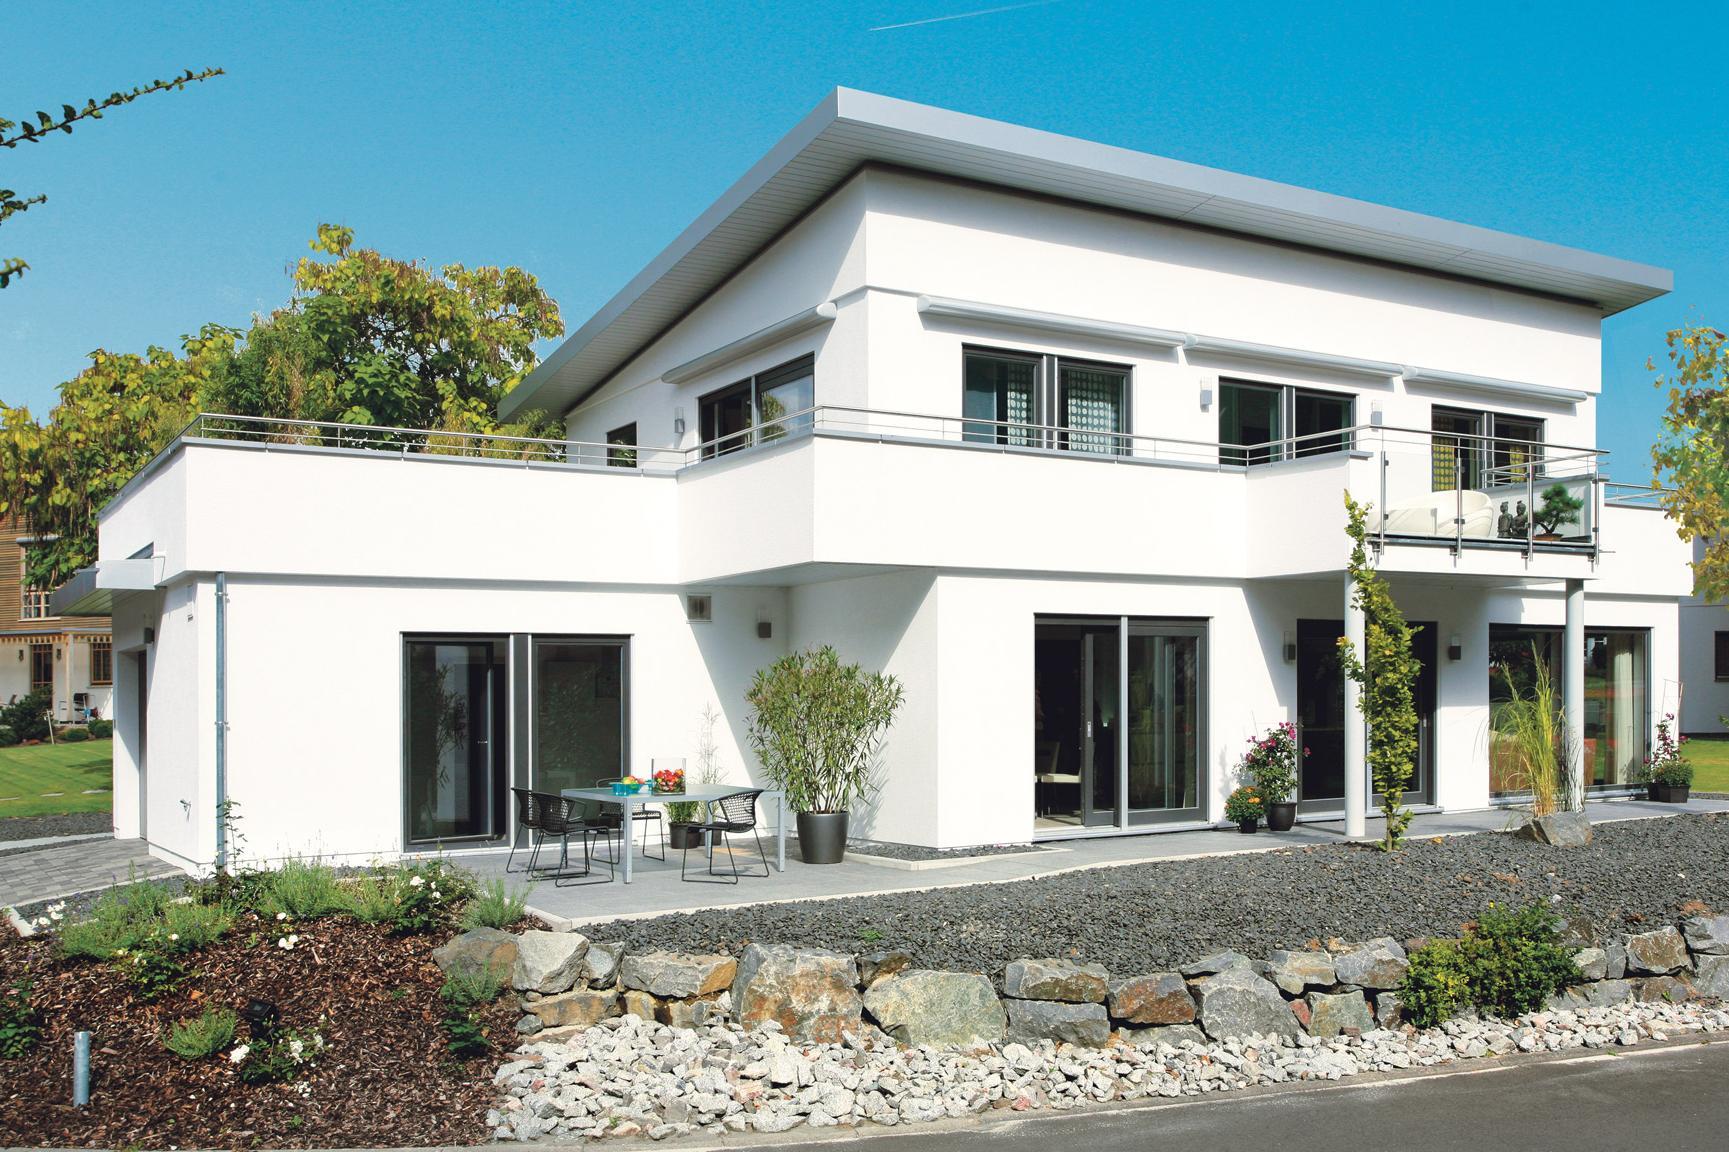 schw rer musterhaus in bad vilbel bei frankfurt schw rerhaus. Black Bedroom Furniture Sets. Home Design Ideas